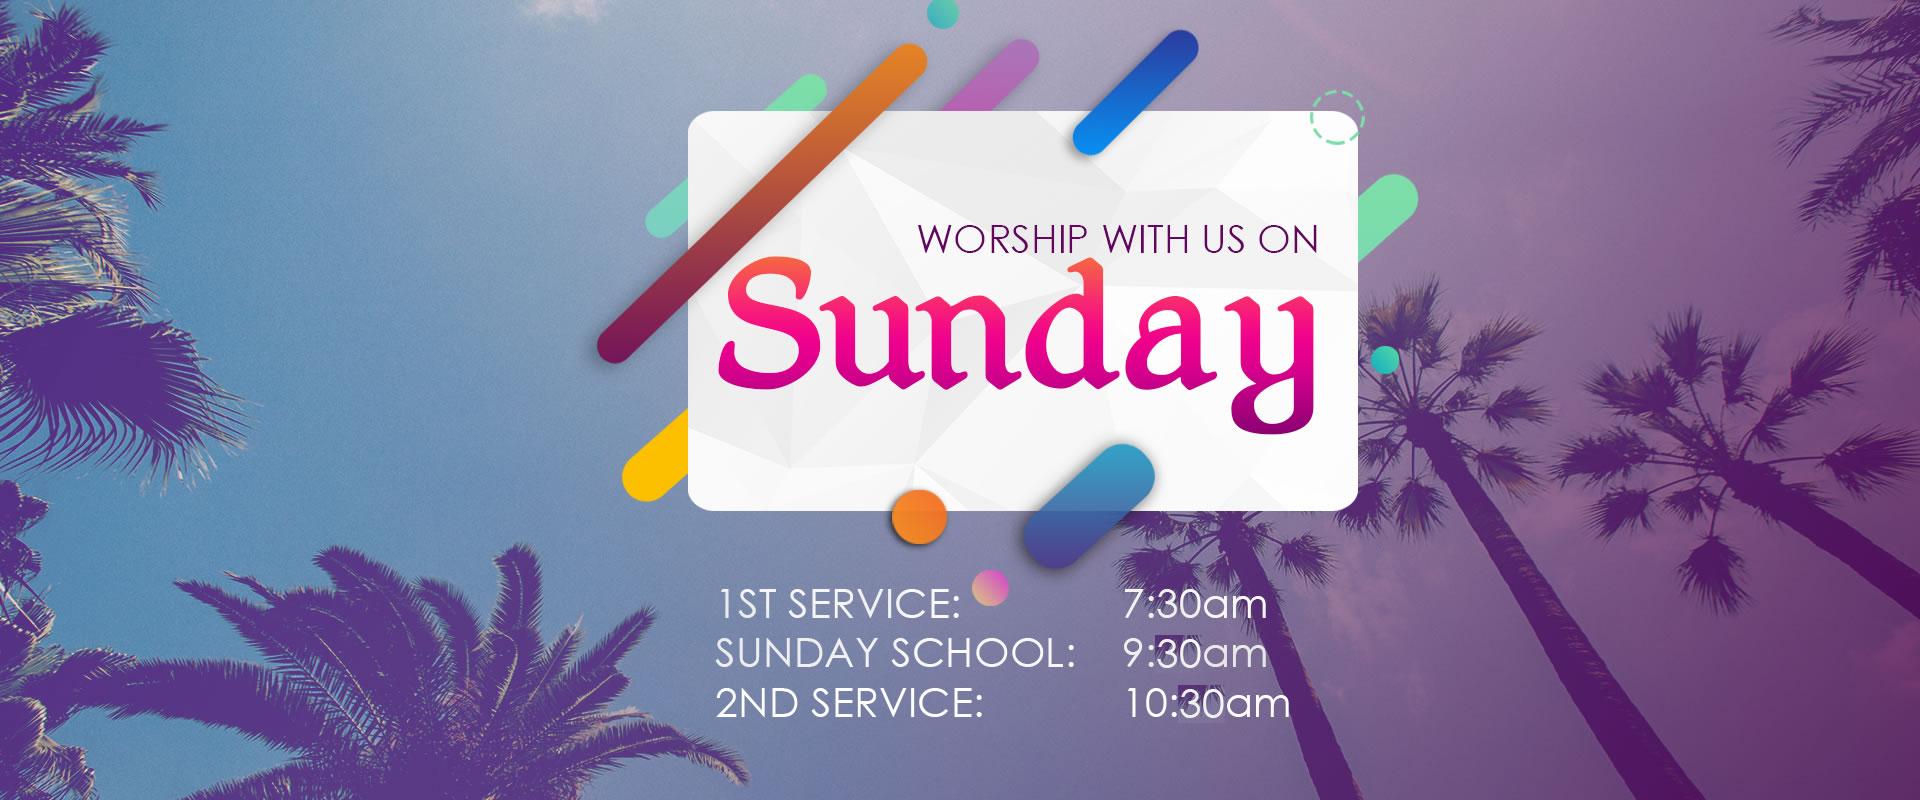 KIC worship with us